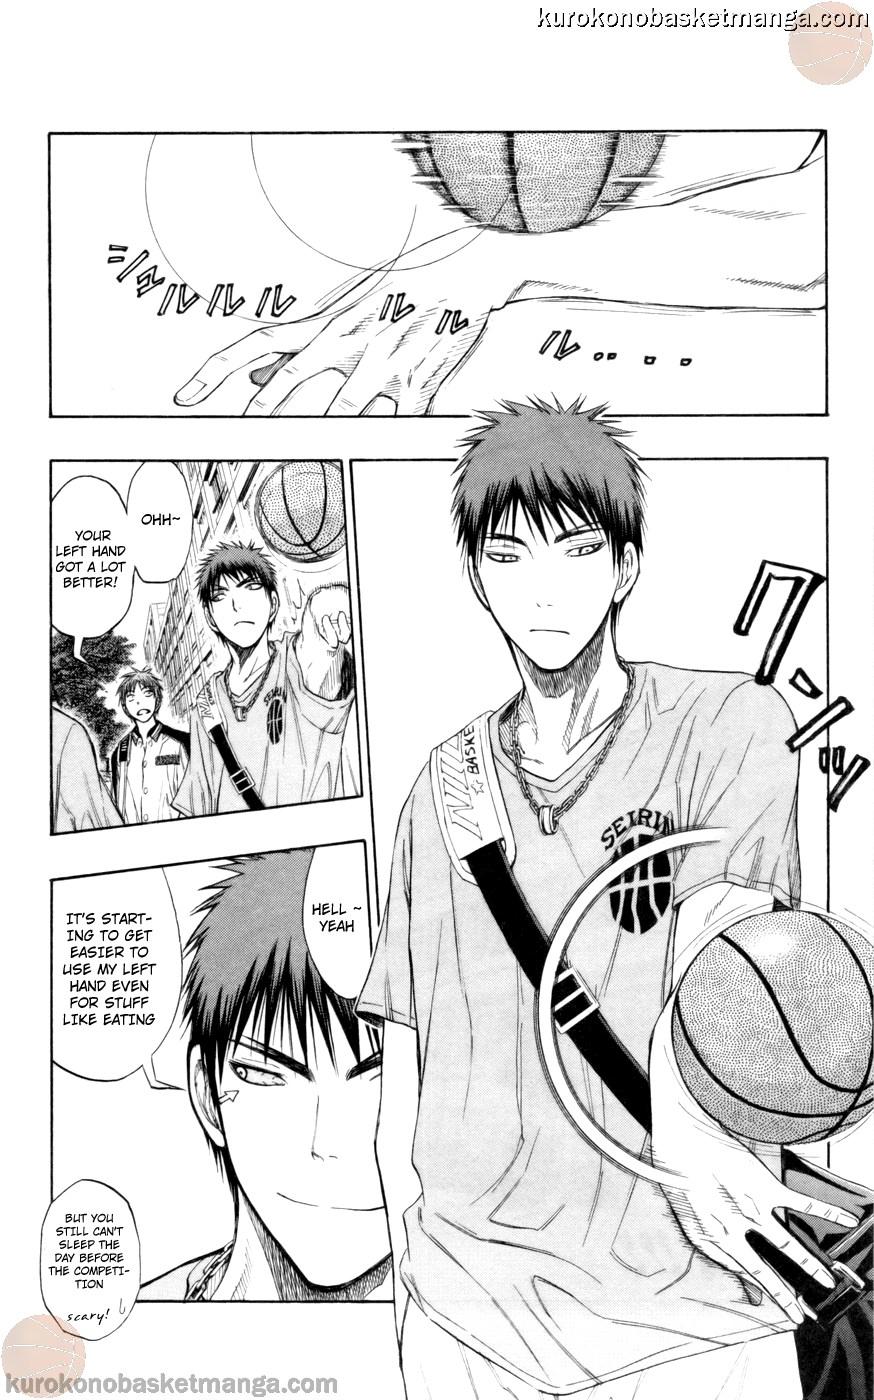 Kuroko no Basket Manga Chapter 81 - Image 08